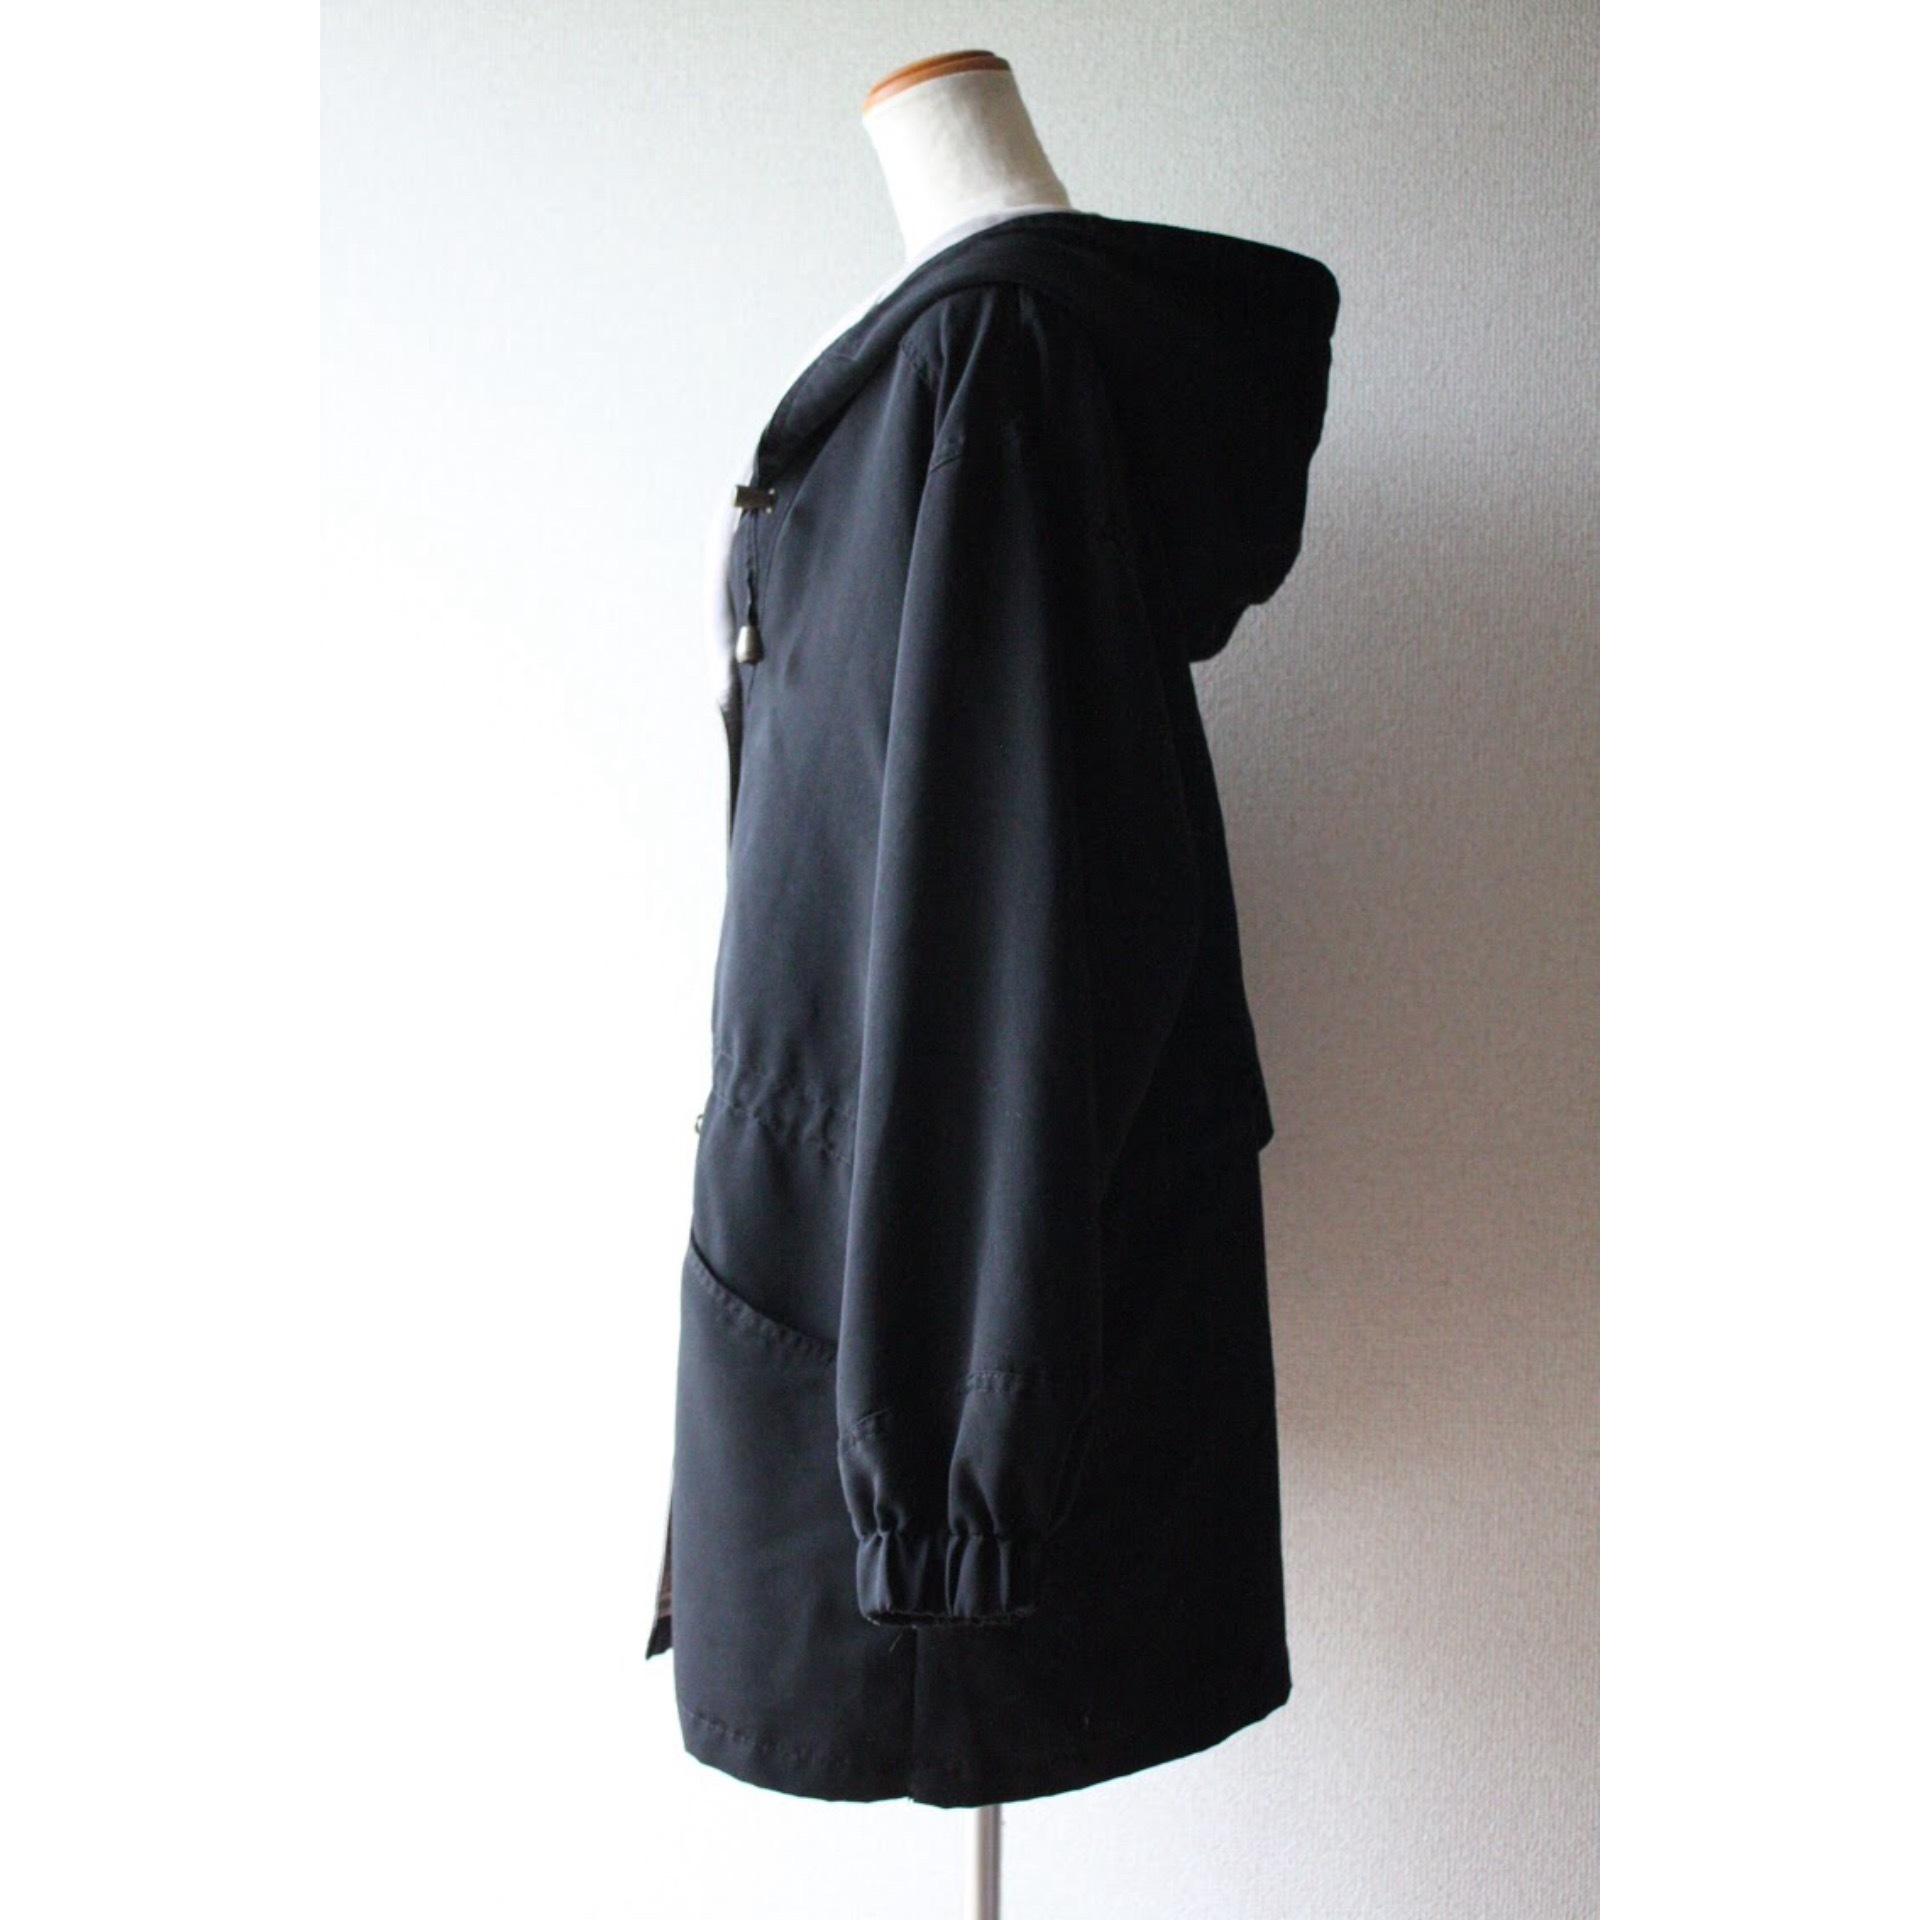 Vintage hooded jacket